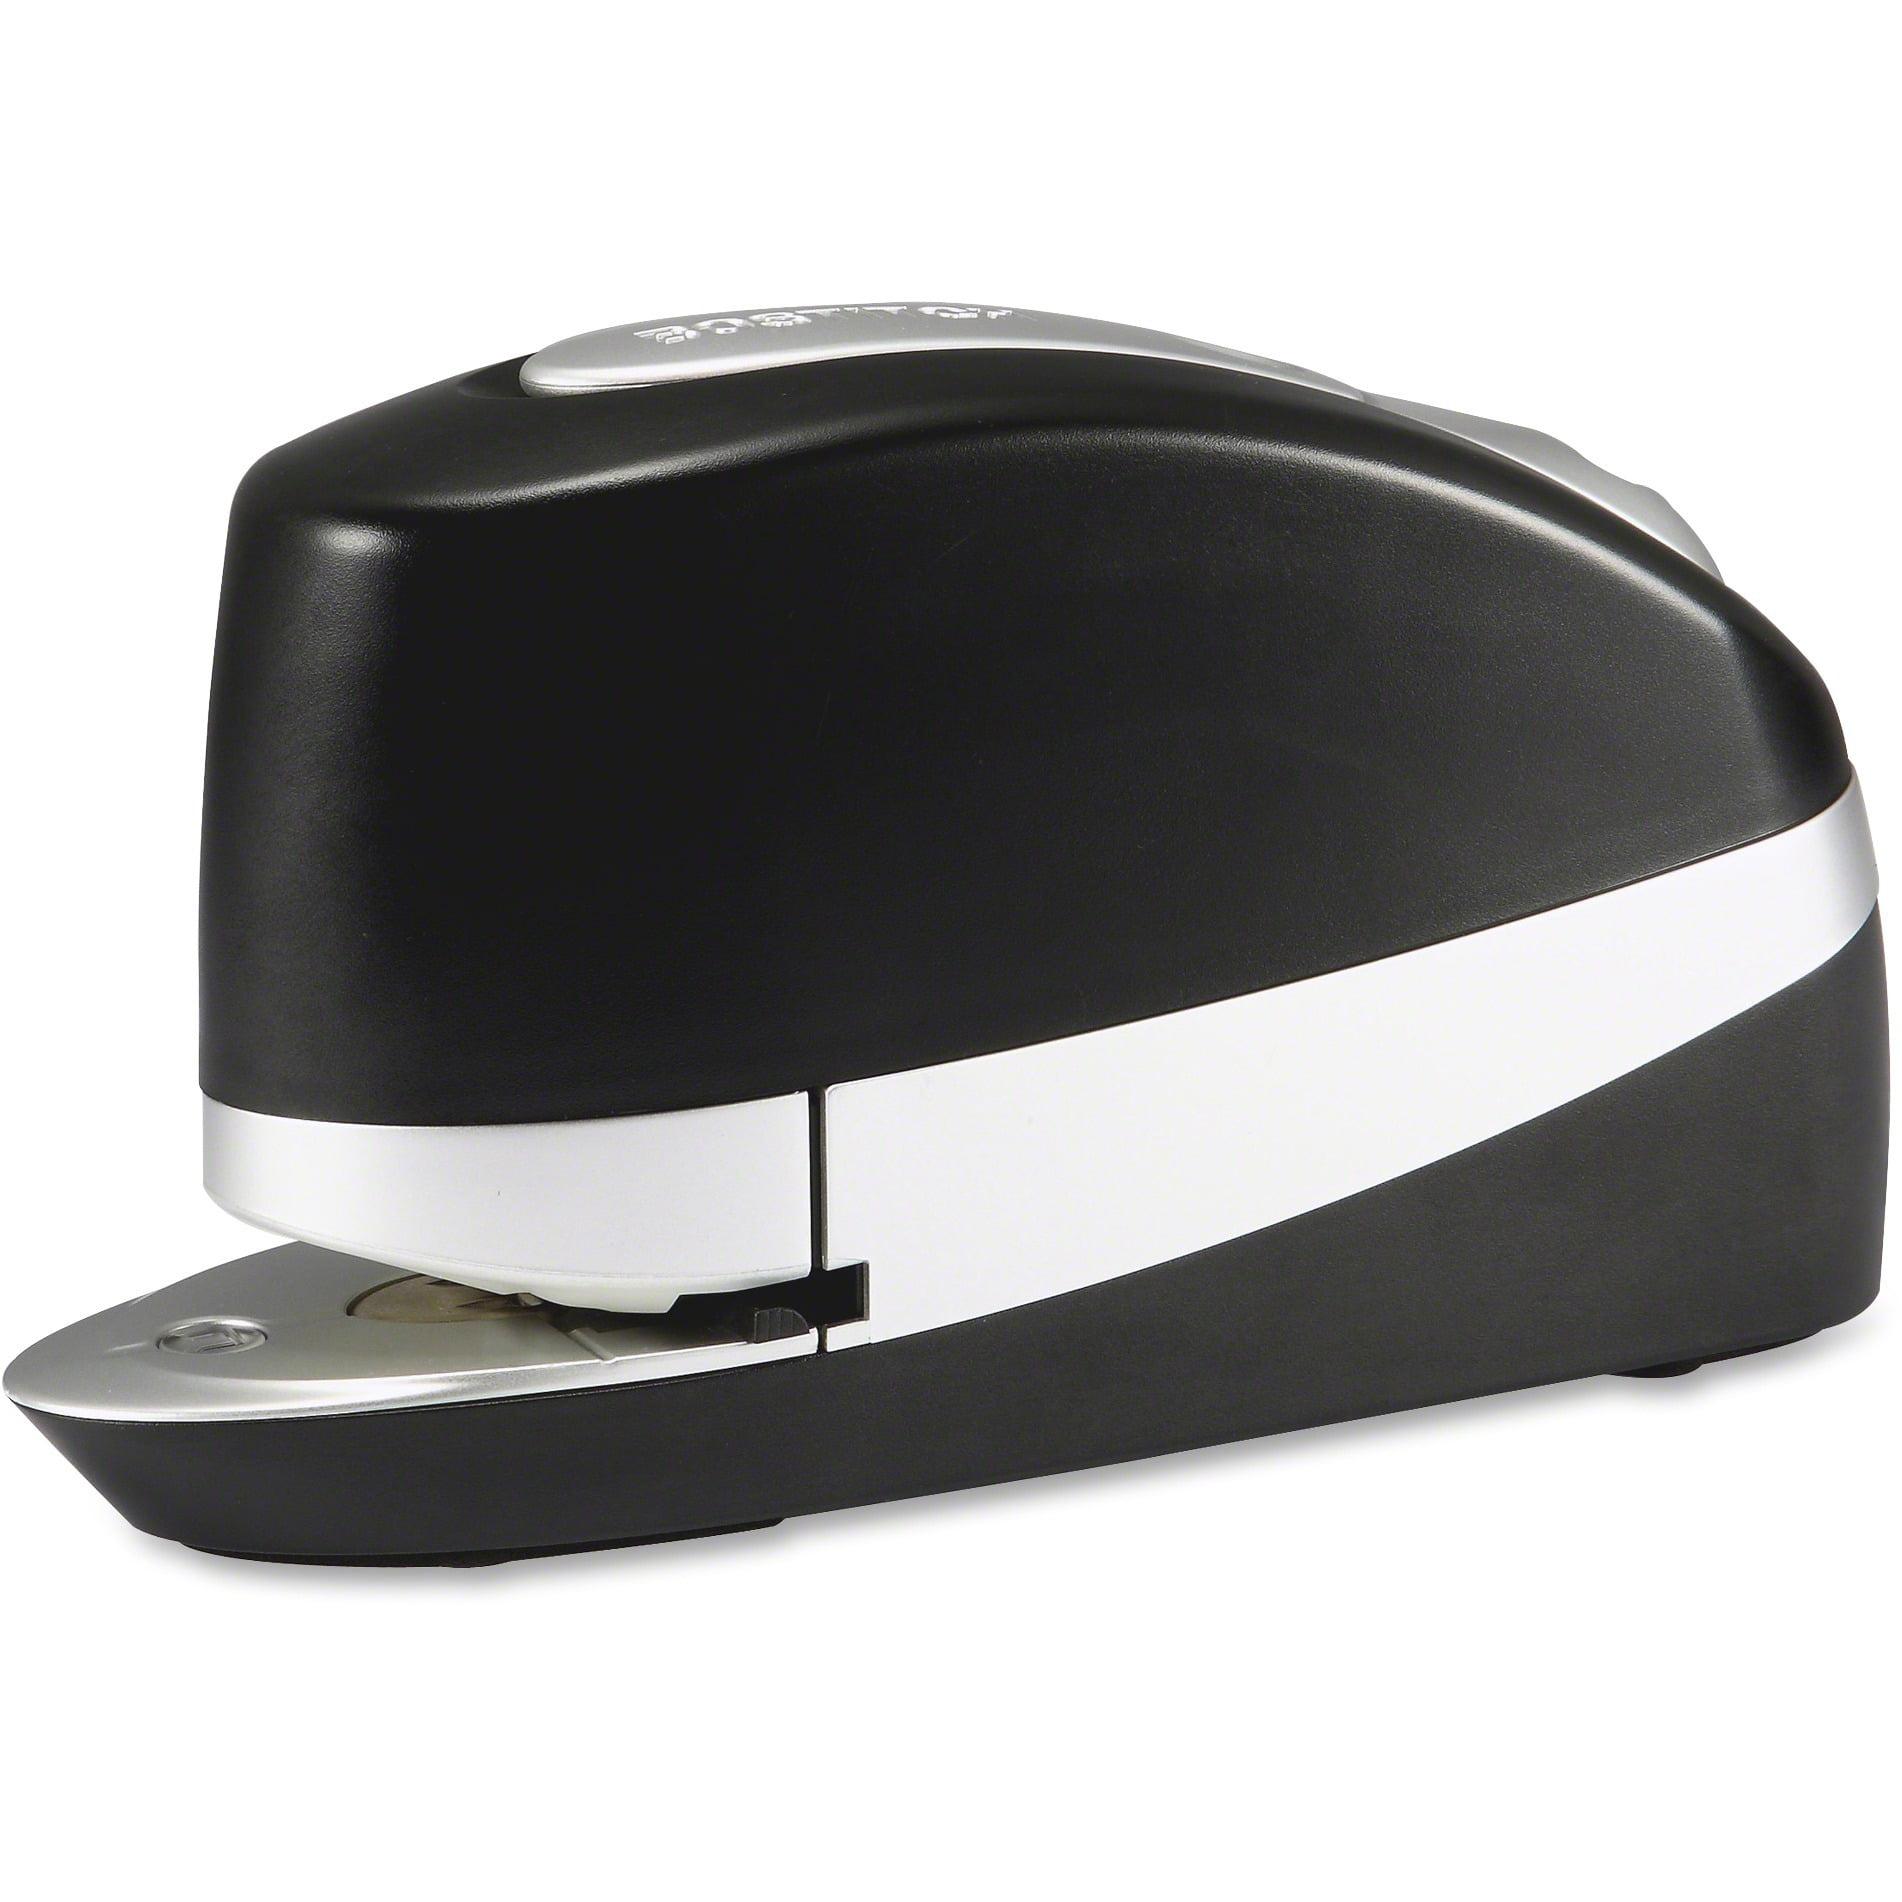 Bostitch, BOS20SUITEBLK, Impulse 20 Executive Electric Stapler, 1 Each, Black,Silver by Amax Inc